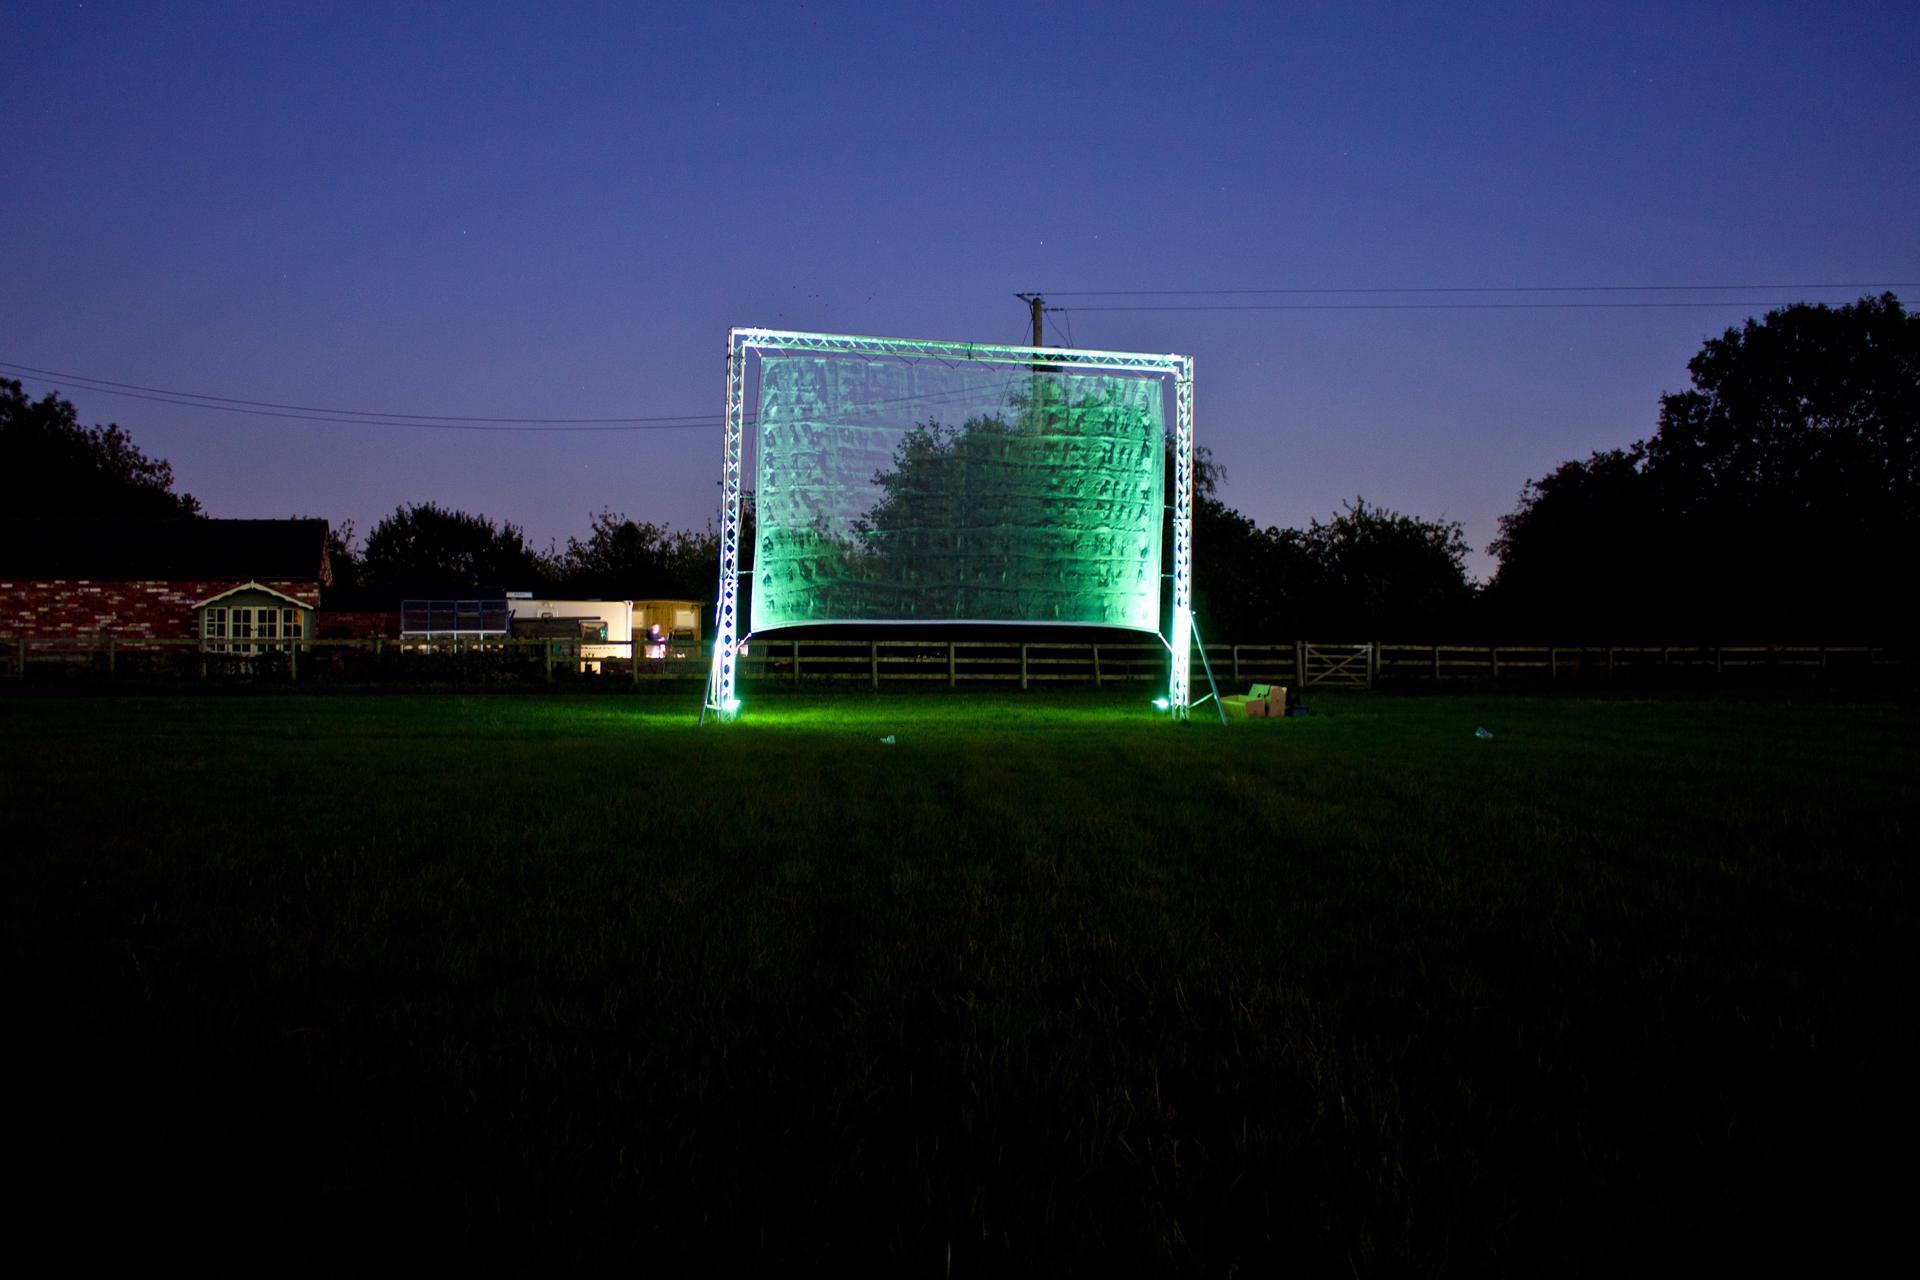 5m-high-laser-screen_23708032702_o-1920x1280.jpg